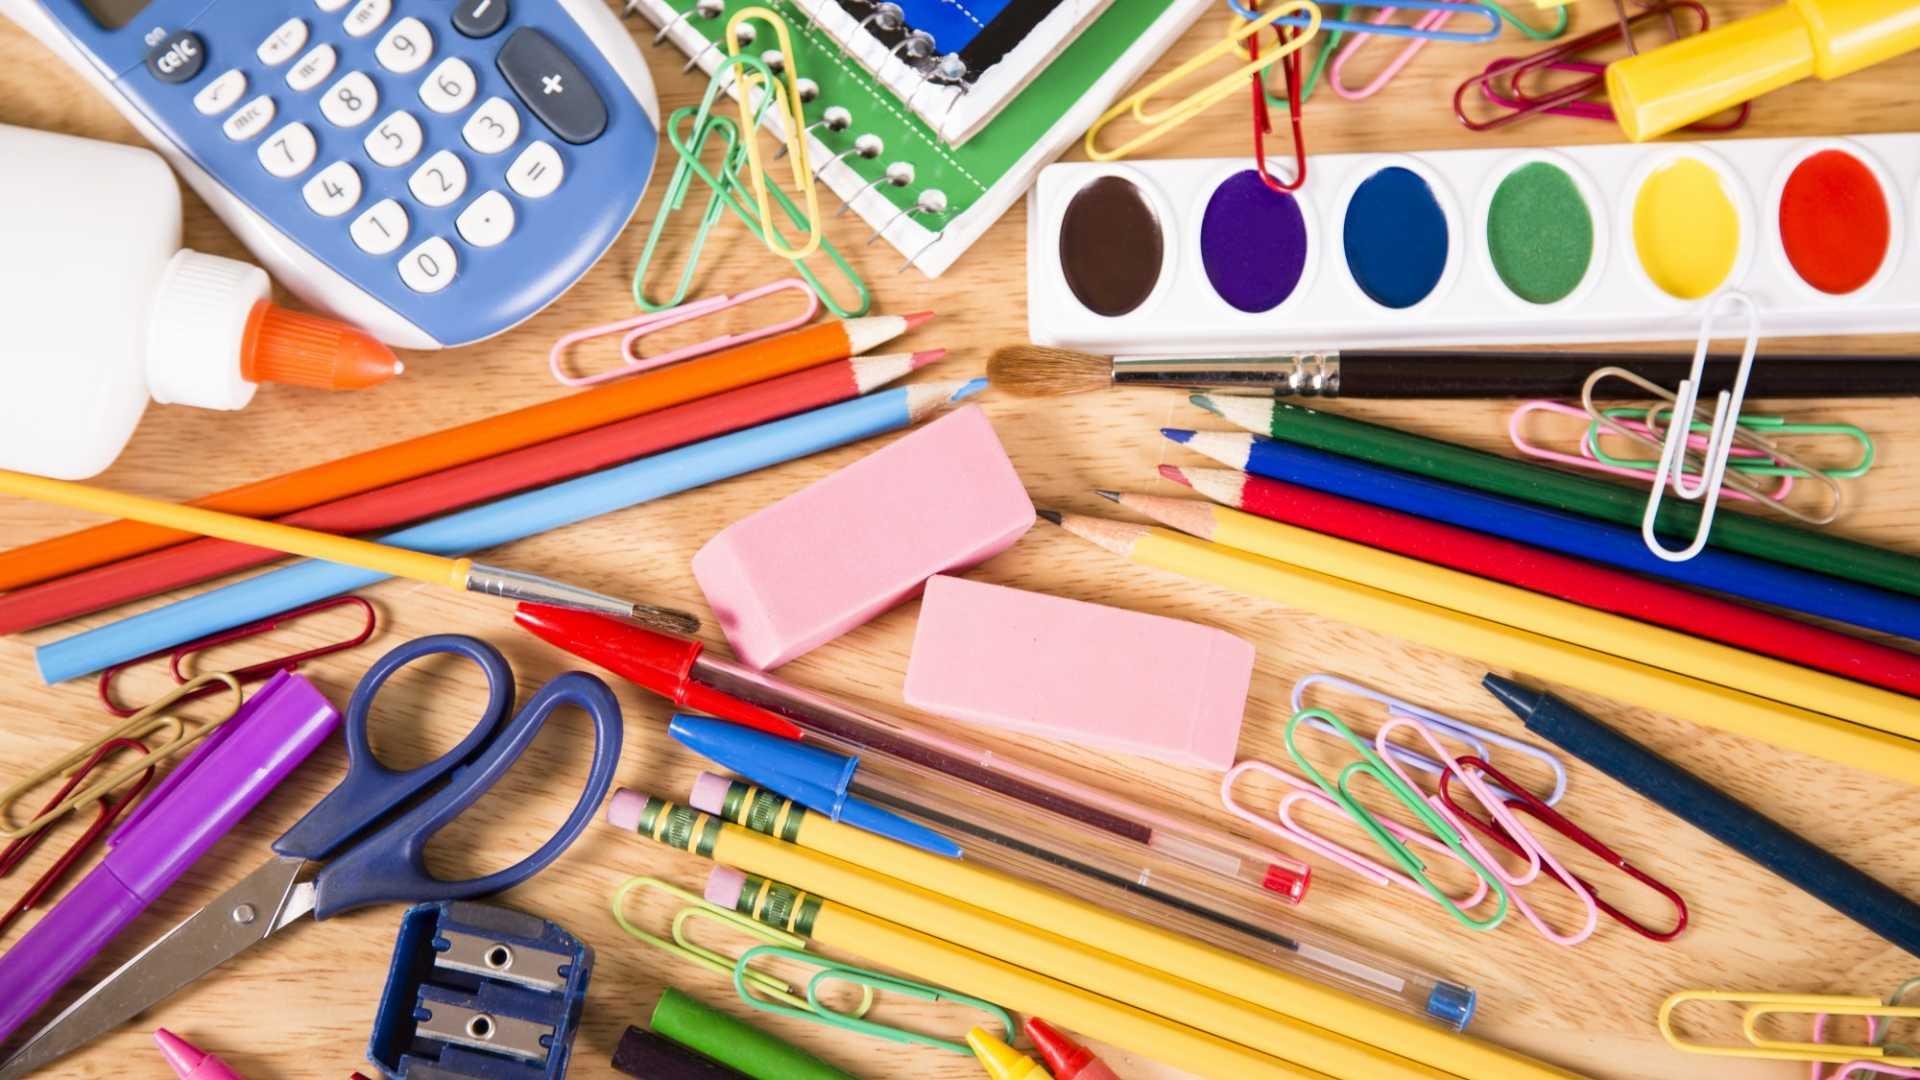 7 Old-School Tools for Maximizing Creativity